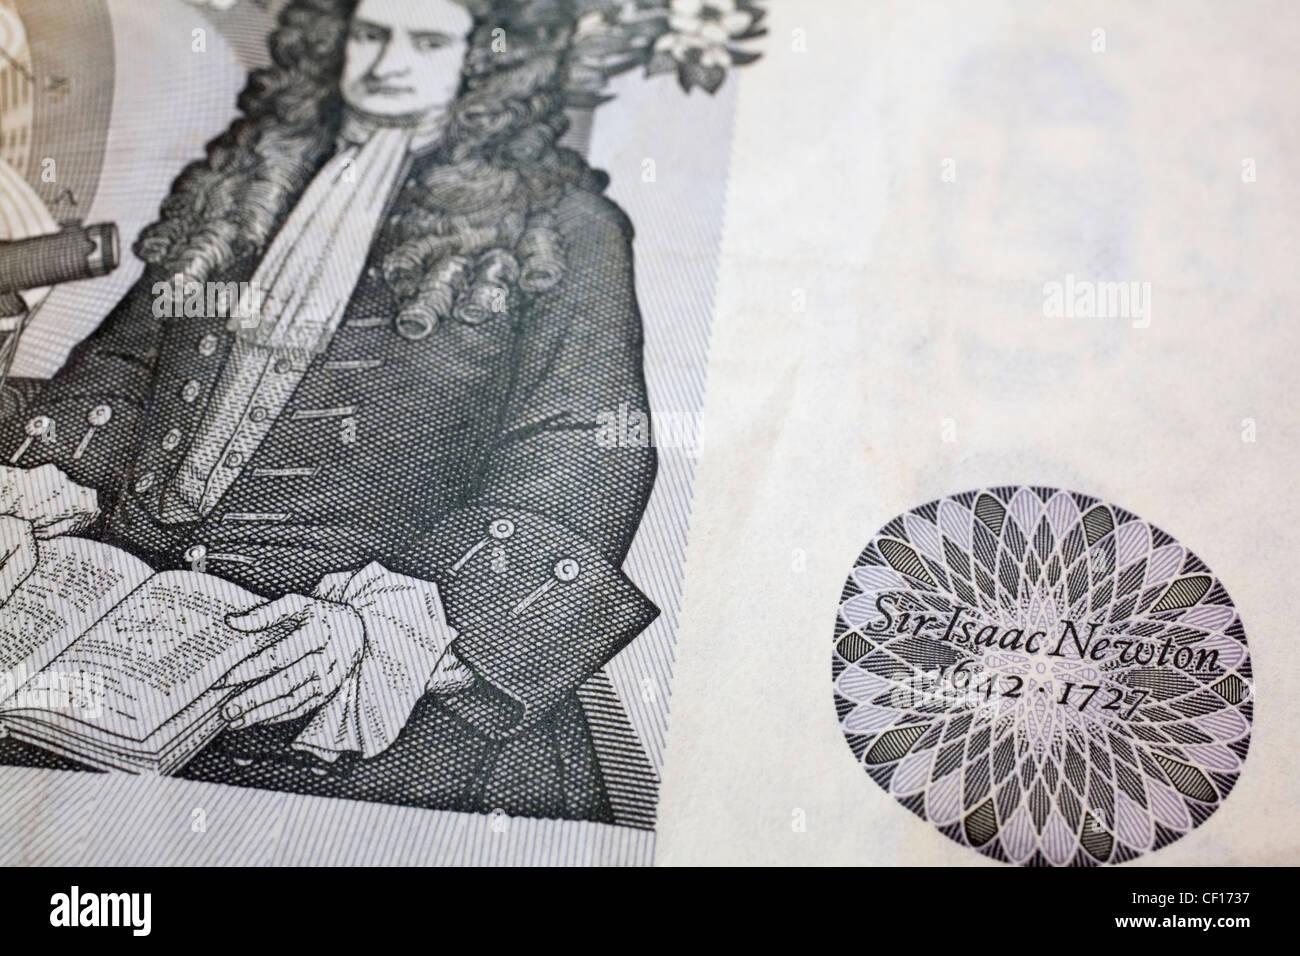 Sir Isaac Newton Depicted British Pound Bank Note Stock Photo